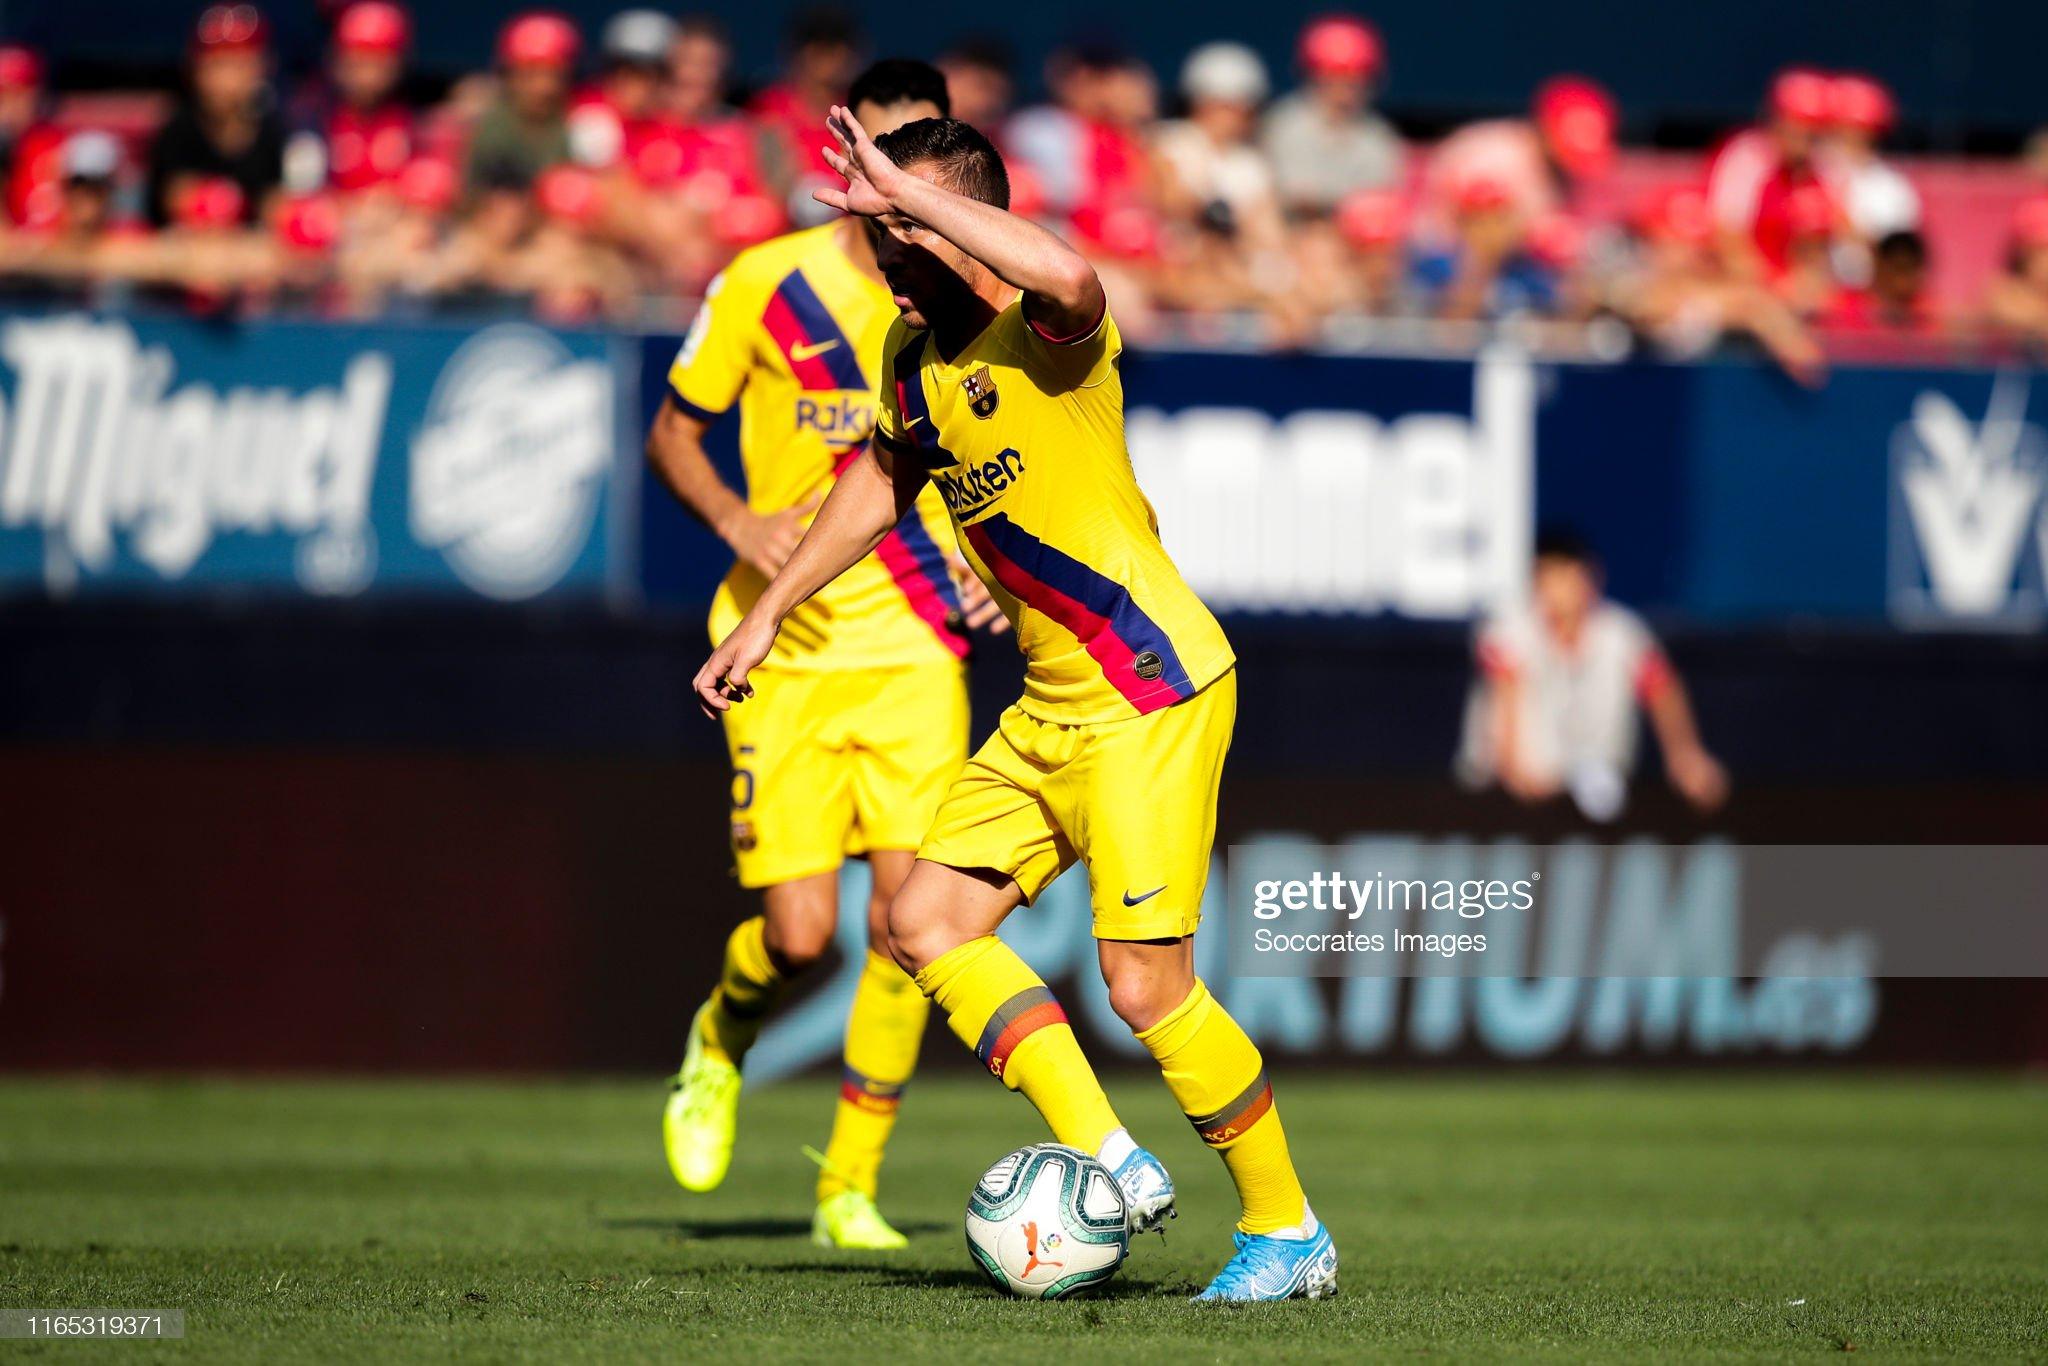 صور مباراة : أوساسونا - برشلونة 2-2 ( 31-08-2019 )  Arthur-of-fc-barcelona-during-the-la-liga-santander-match-between-v-picture-id1165319371?s=2048x2048